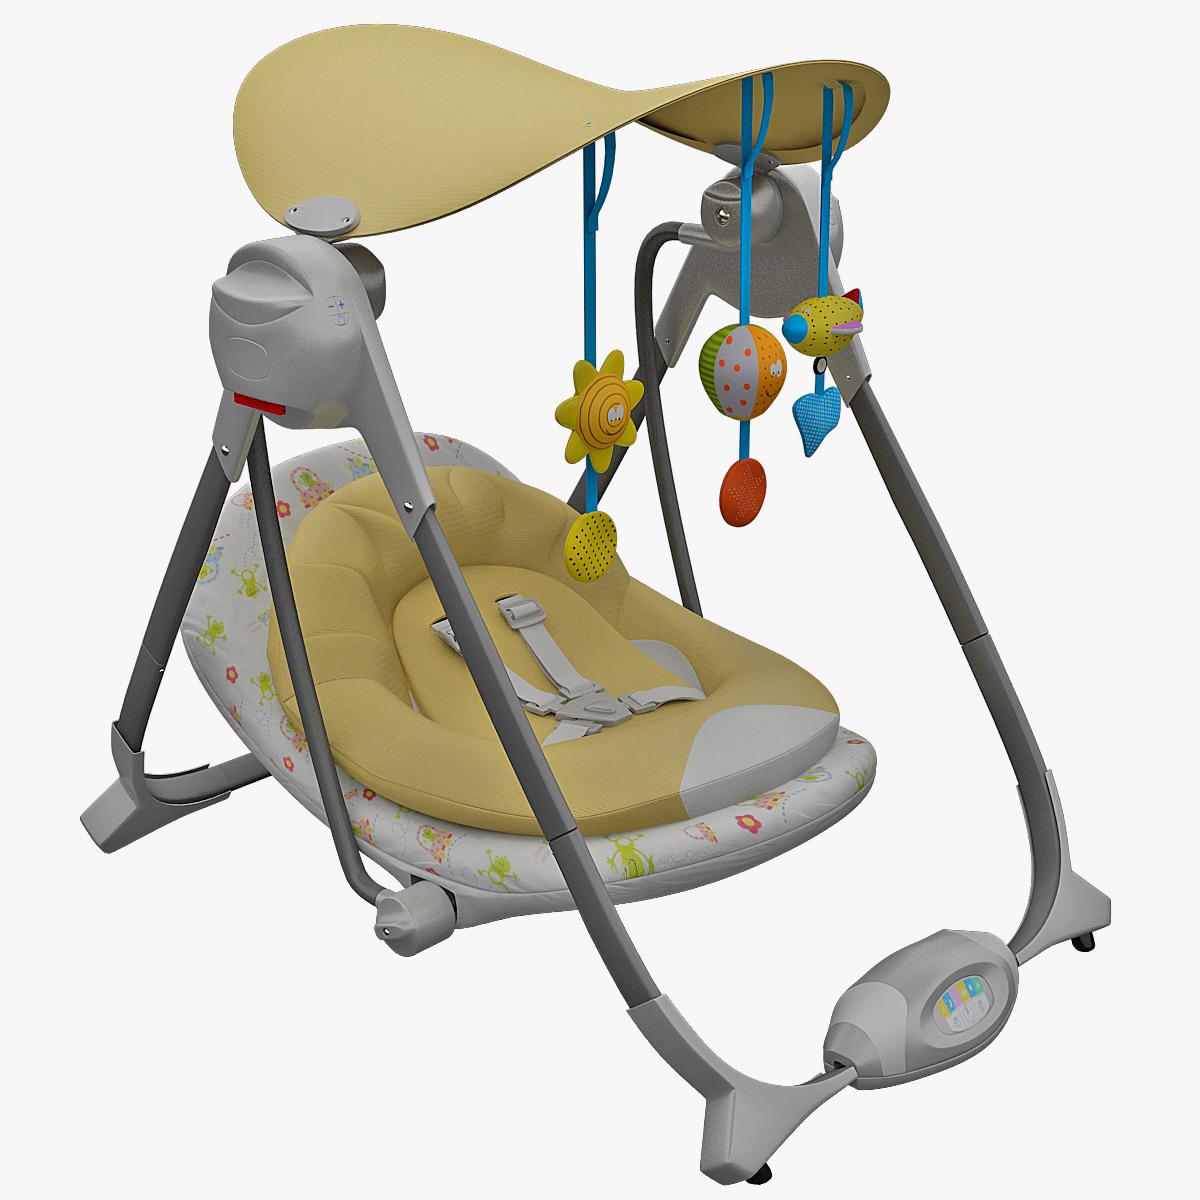 Bouncy_Chair_Chicco_Polly_Swing_000.jpg